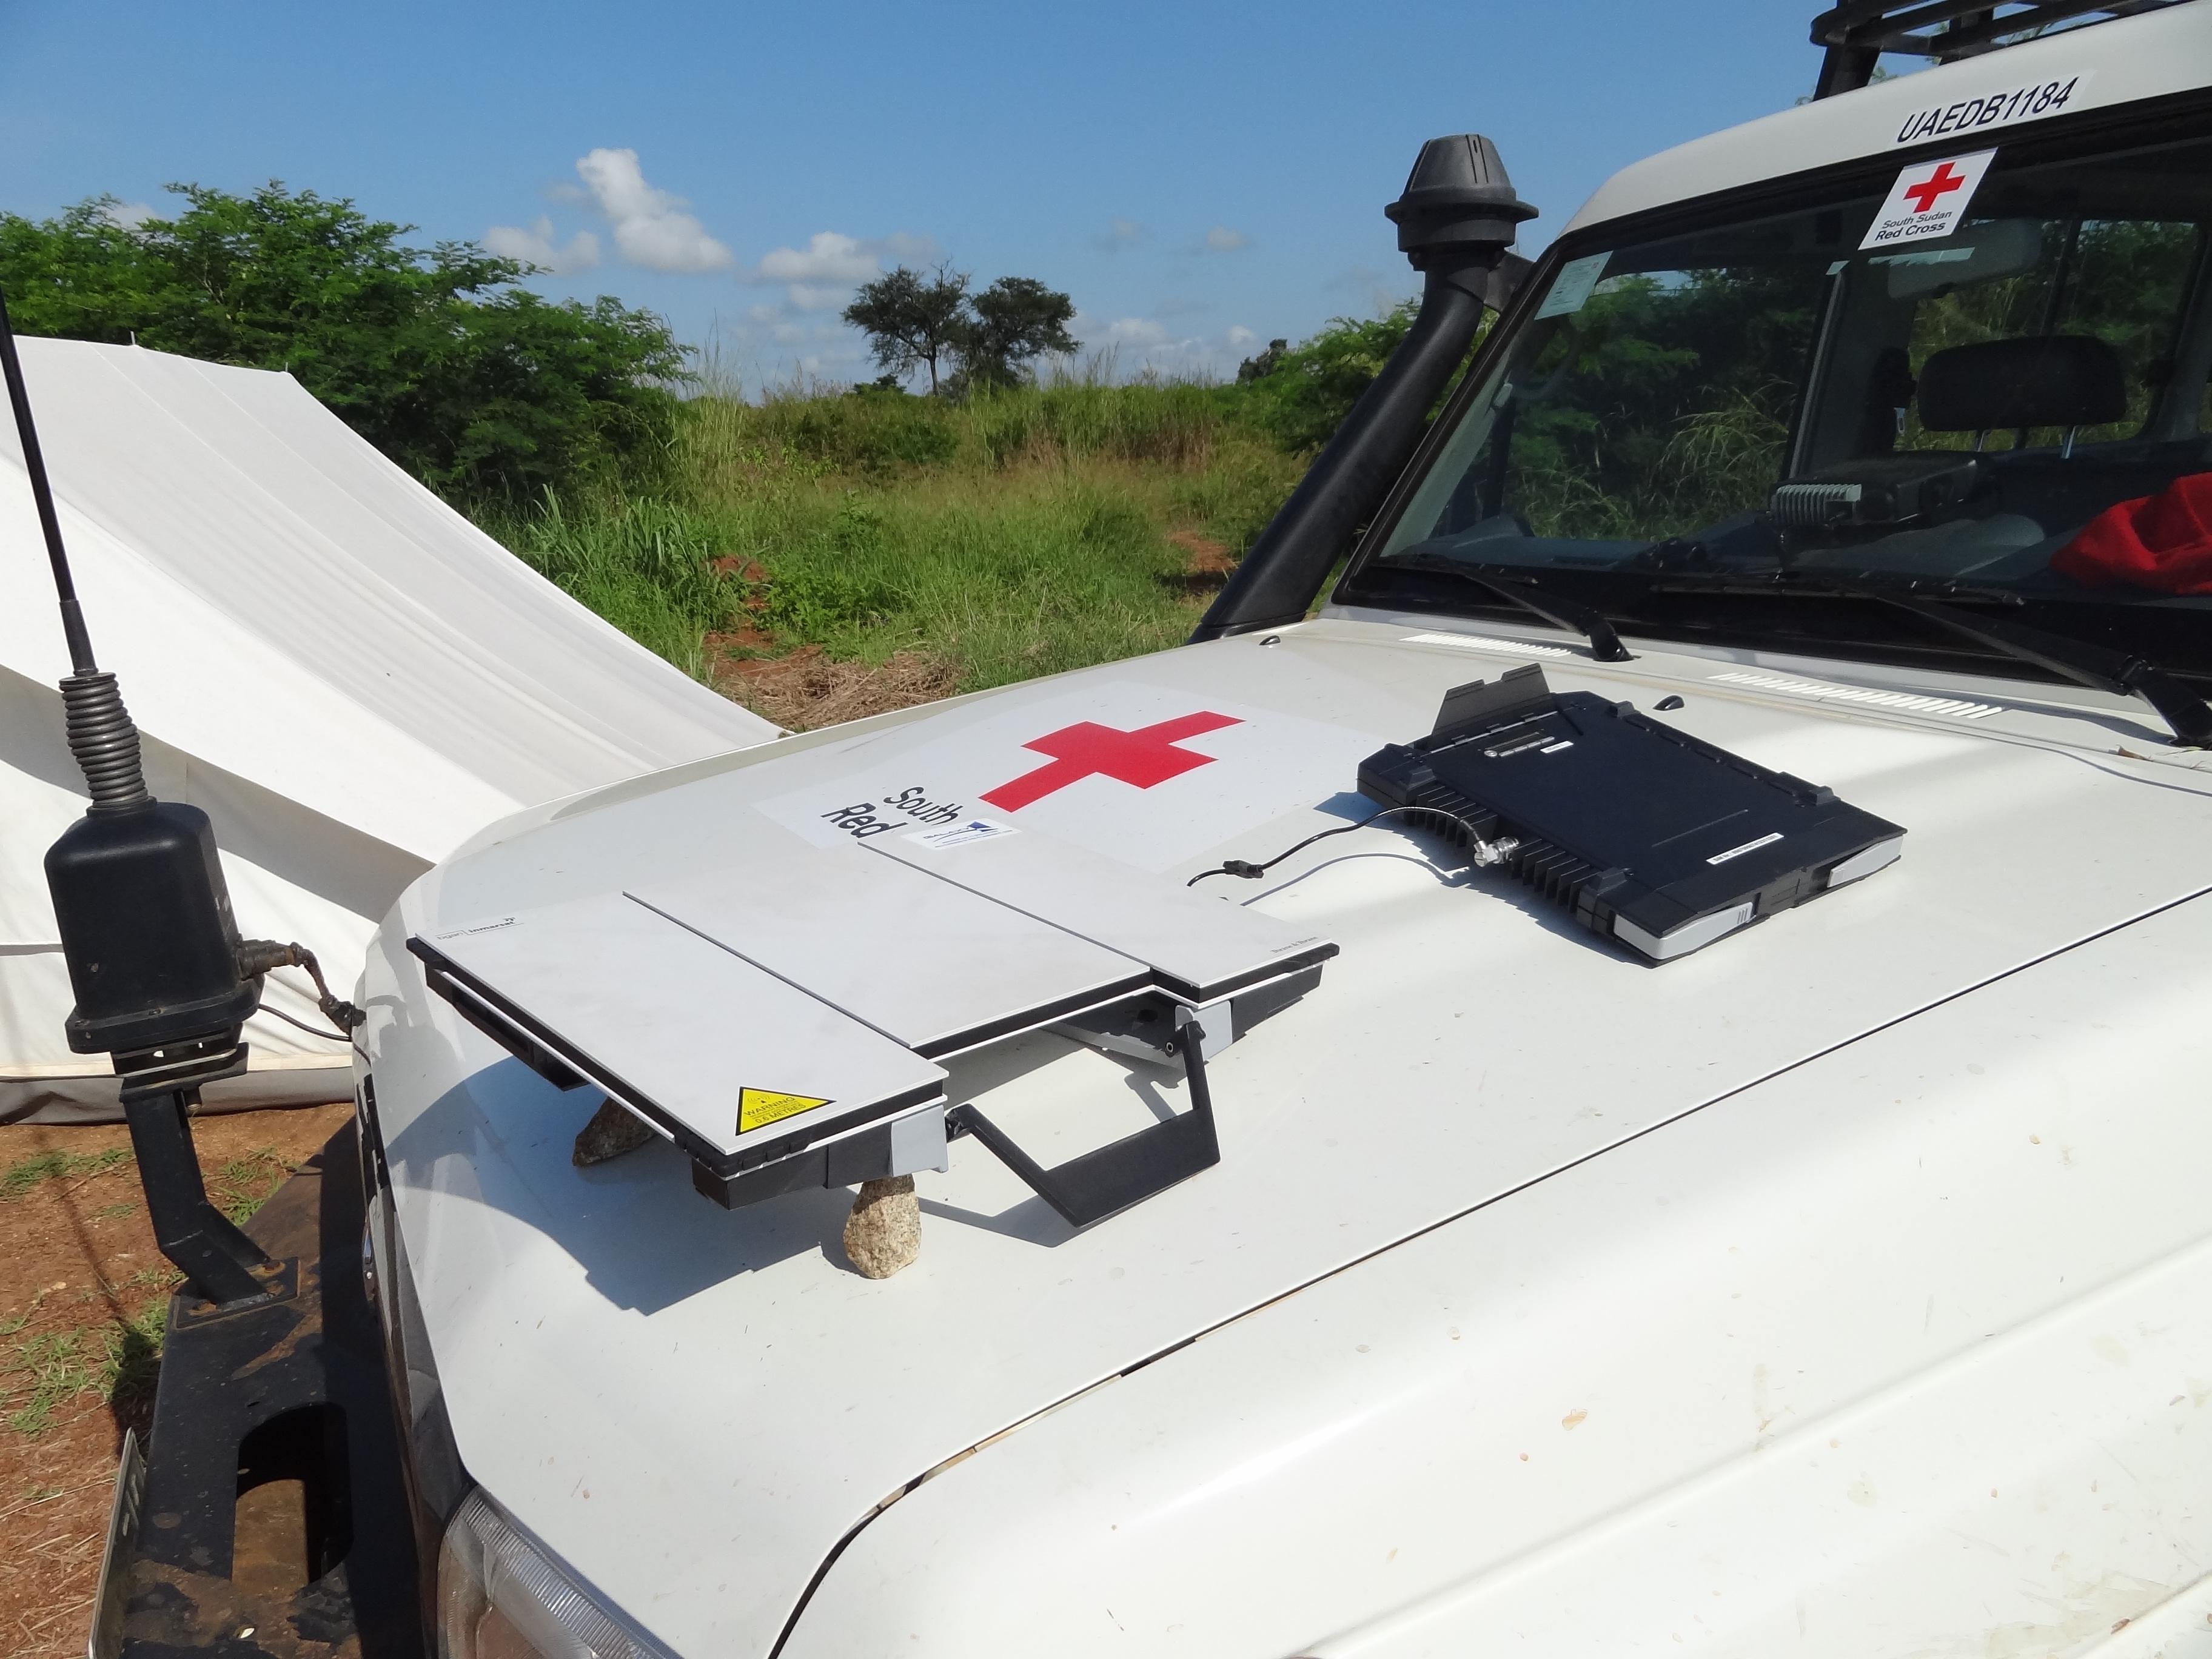 File:Portable Satellite Internet Modem and Antenna jpg